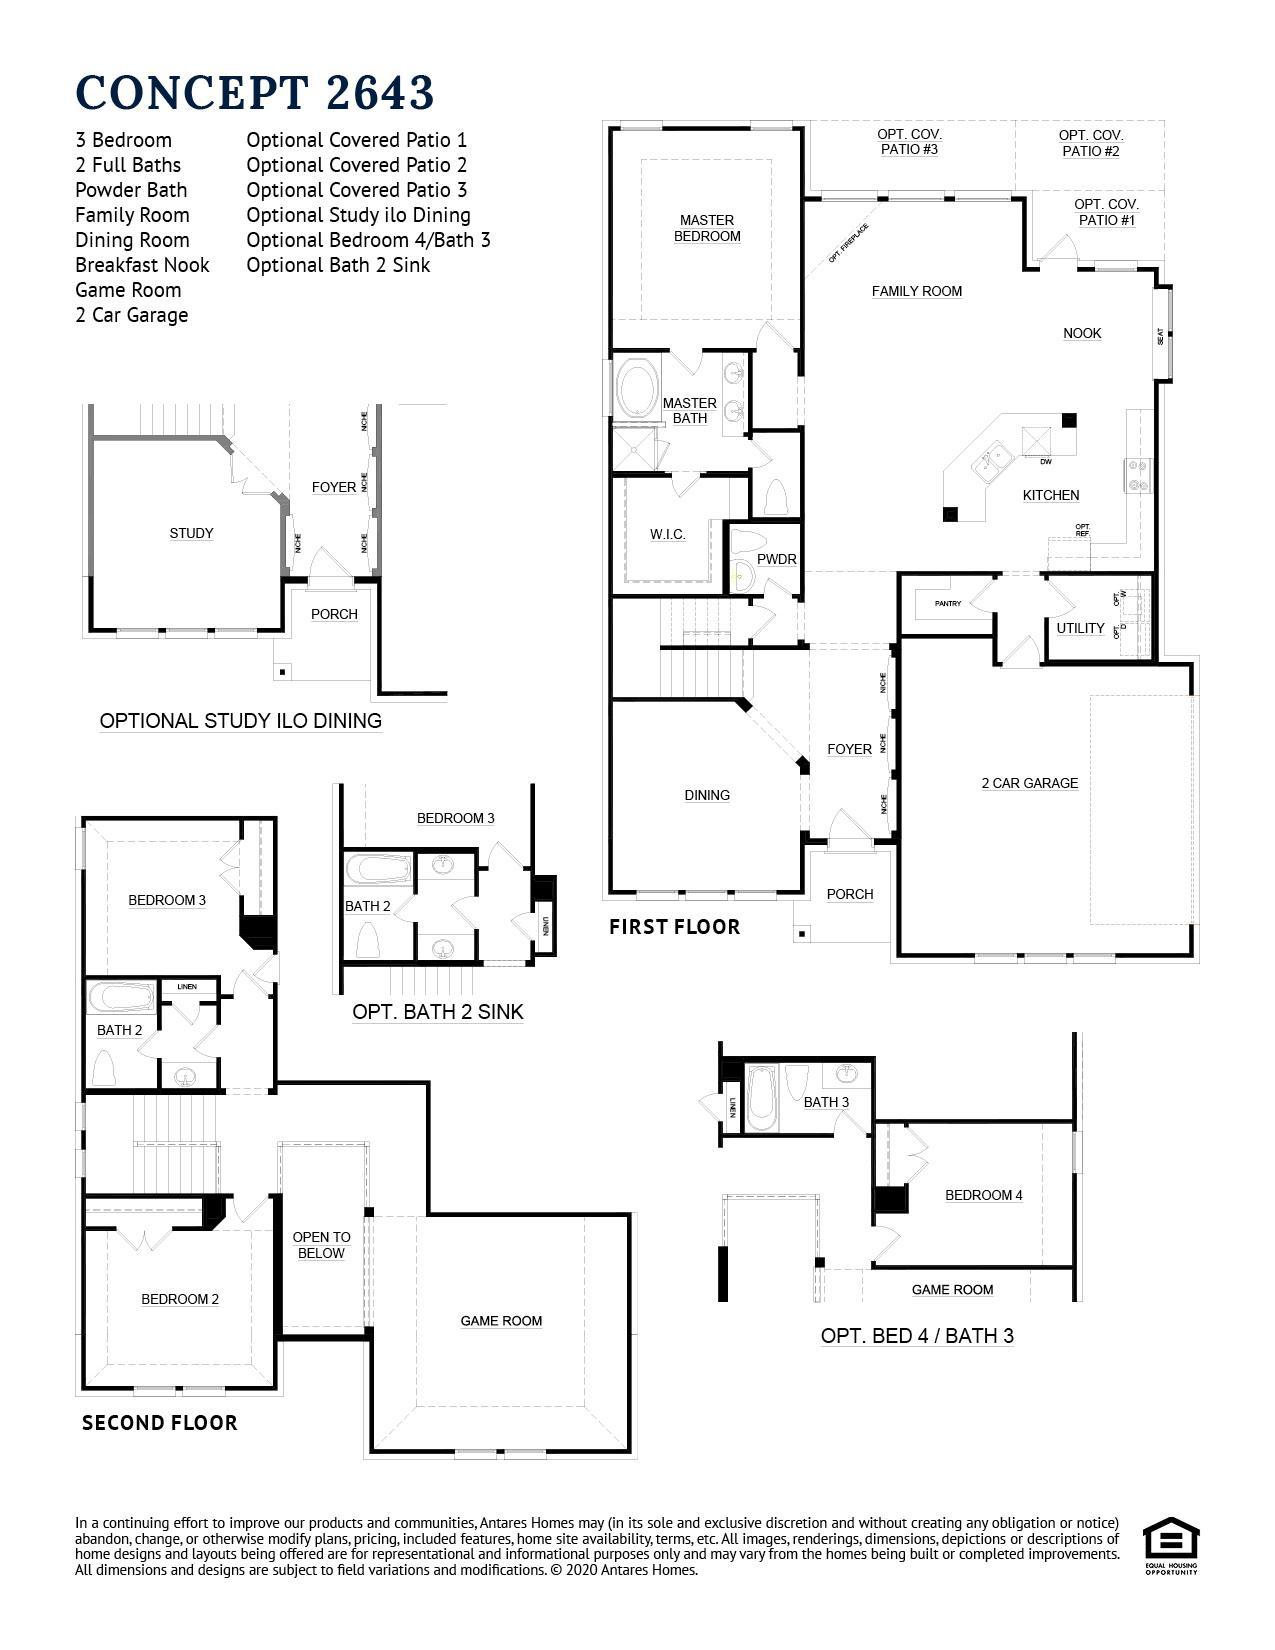 Concept 2643 Floorplan